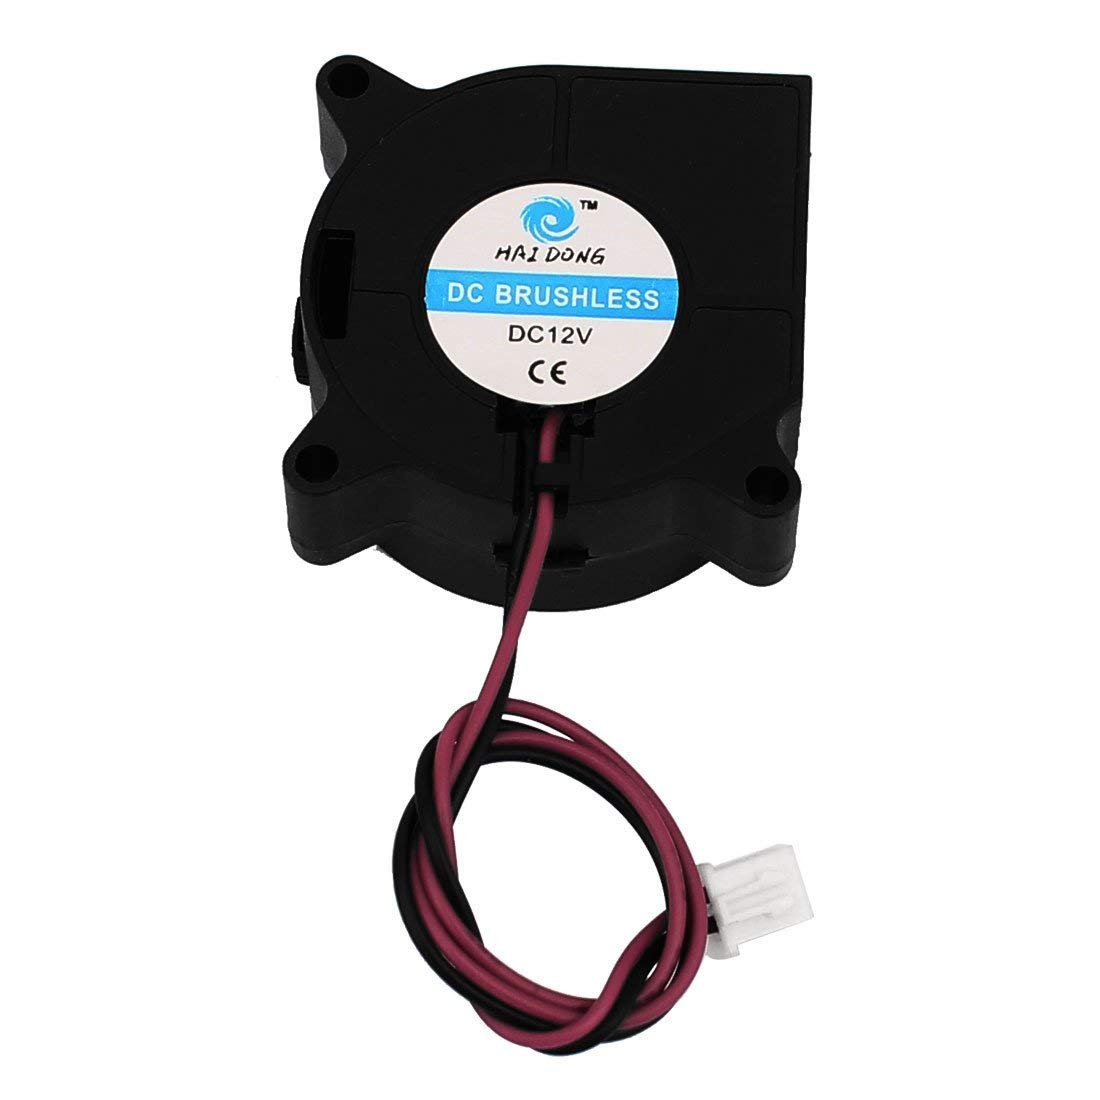 Aodesy DC Brushless Sleeve-Bearing Cooling Turbo Blower Cooler Fan C5015 24V,50 mmx15 mm